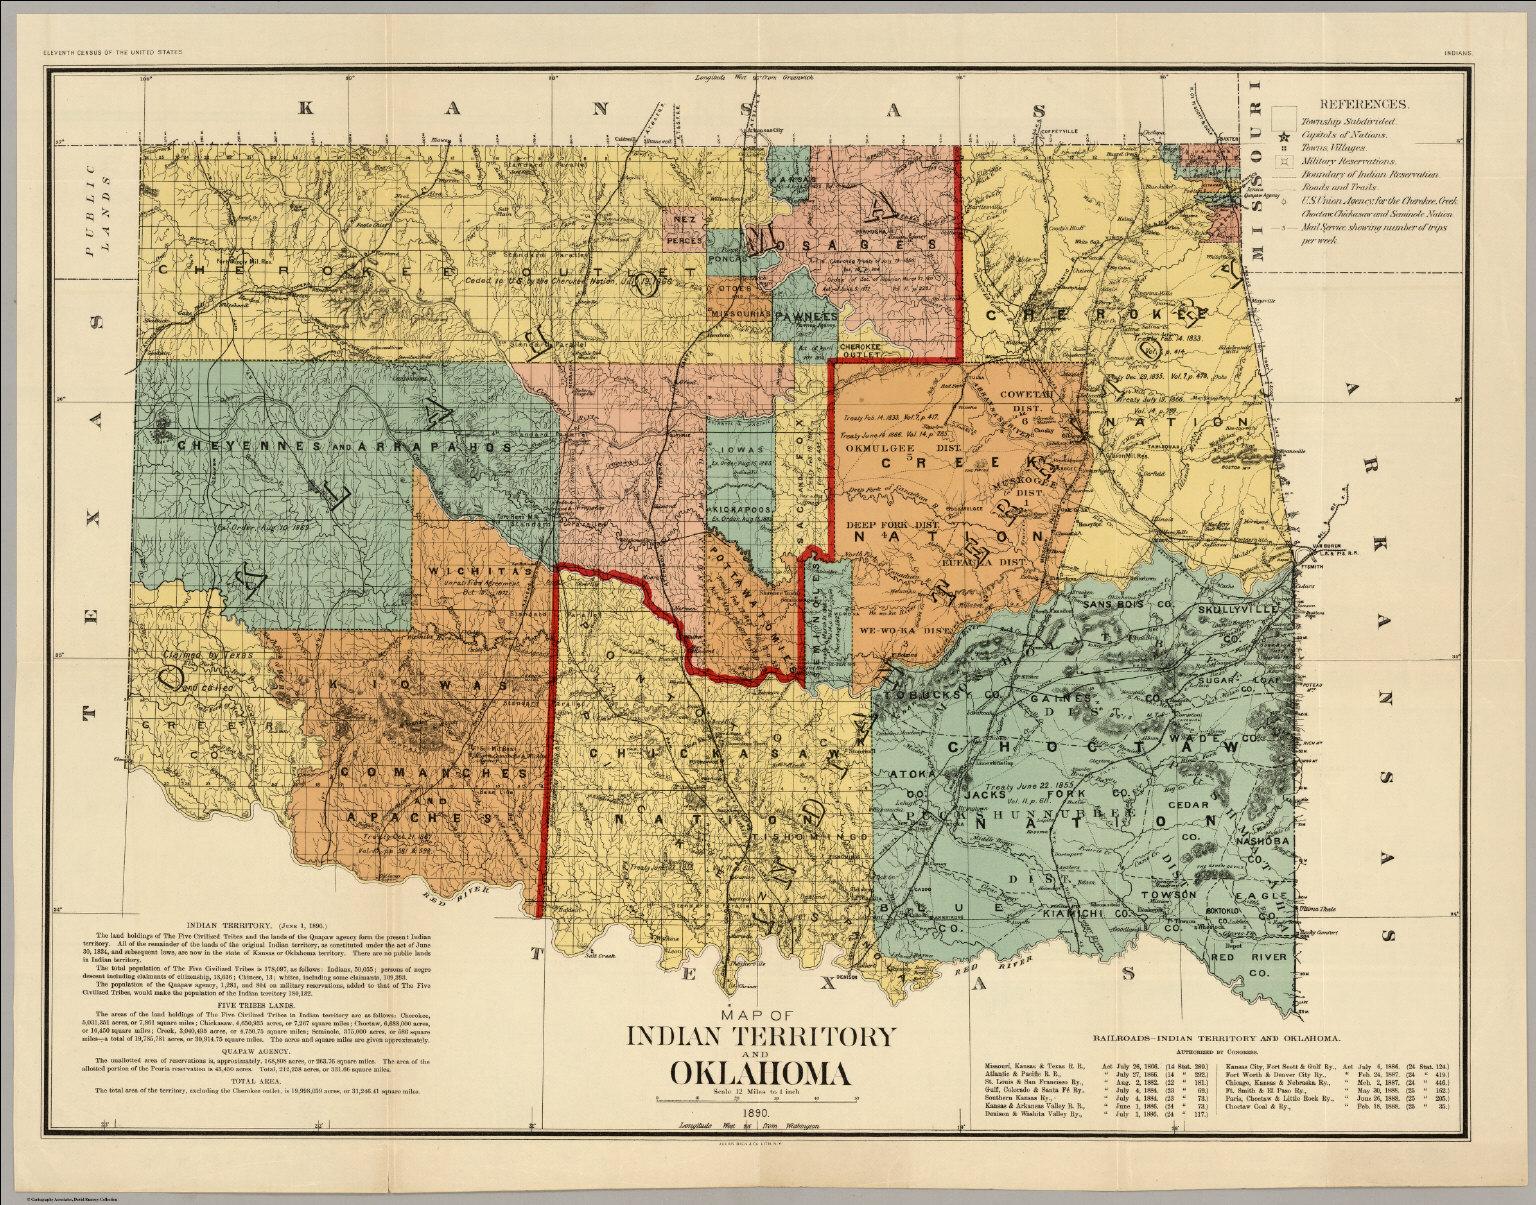 oklahoma indian territory1890 25